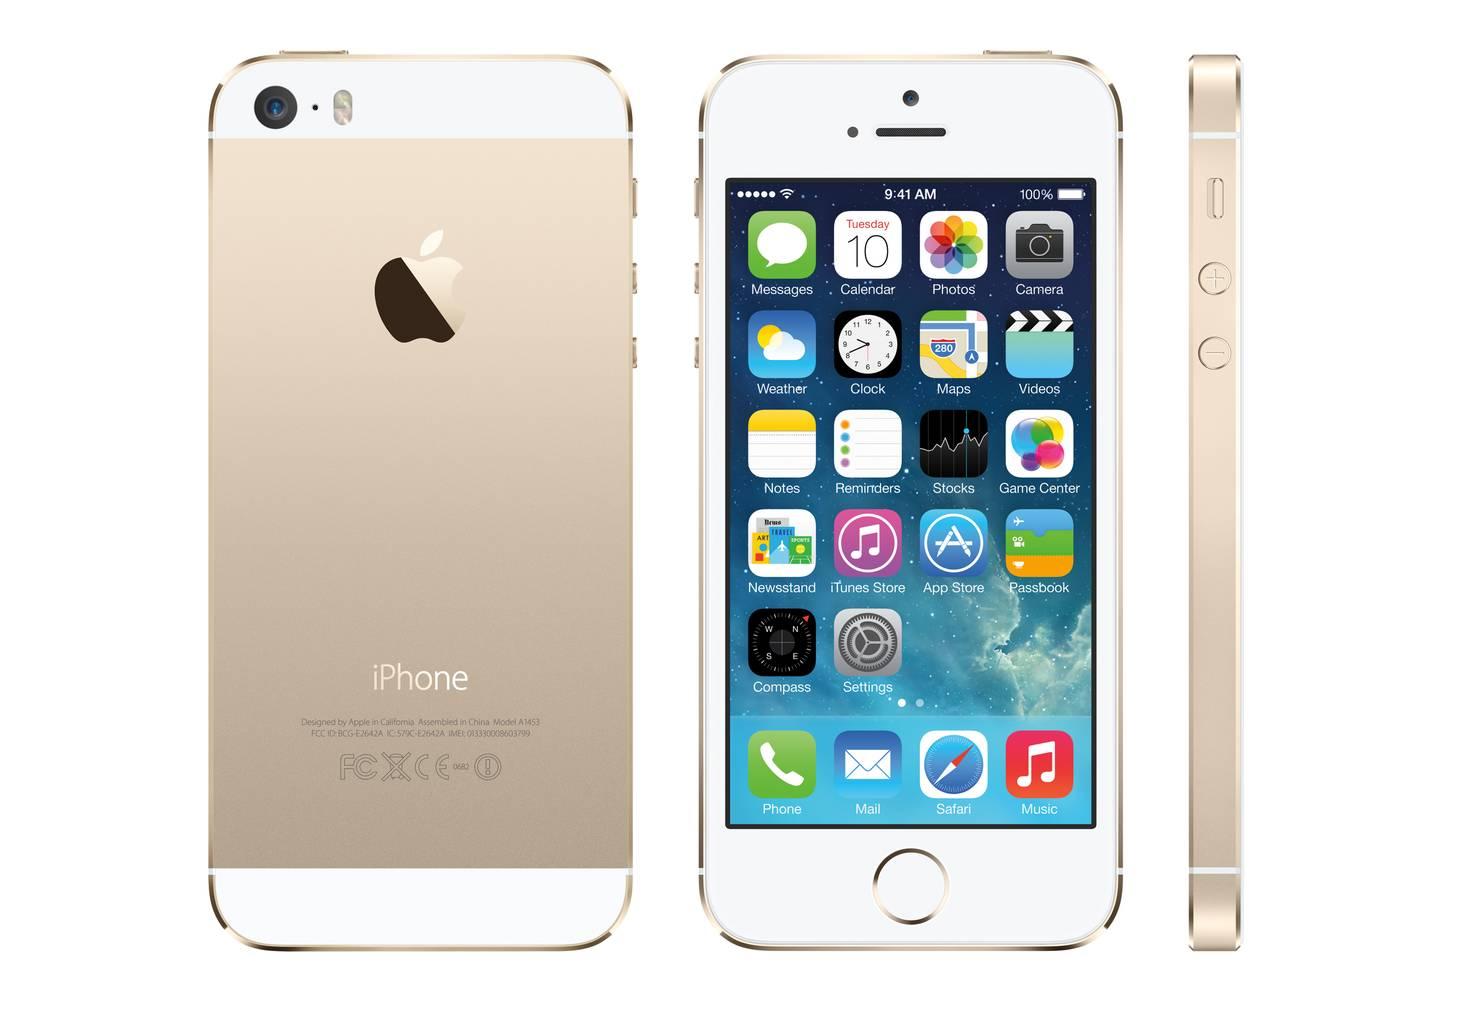 iPhone带给我们的新功能和革命